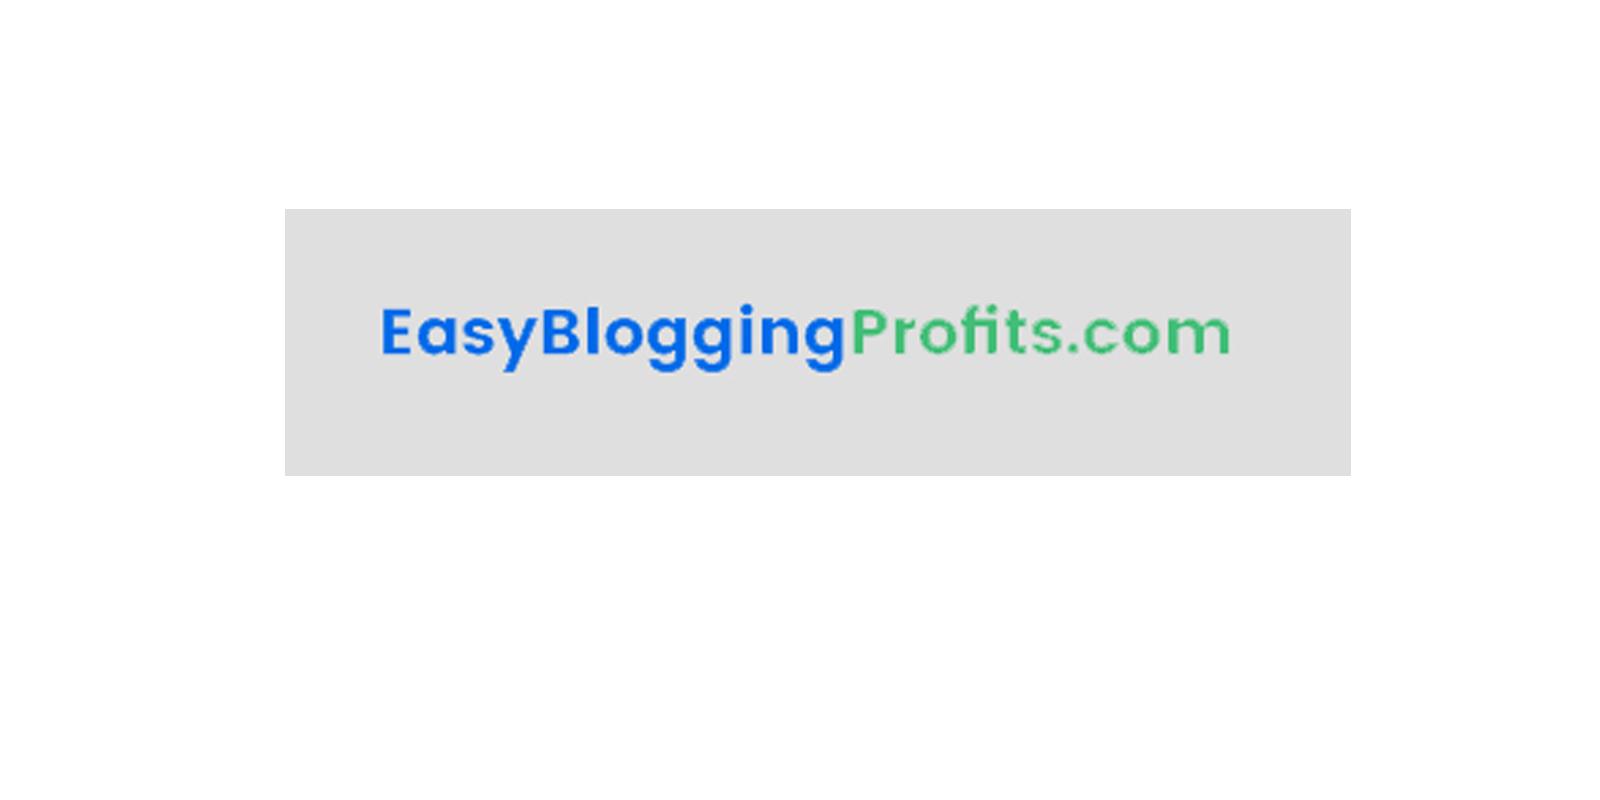 Easy blogging profits review